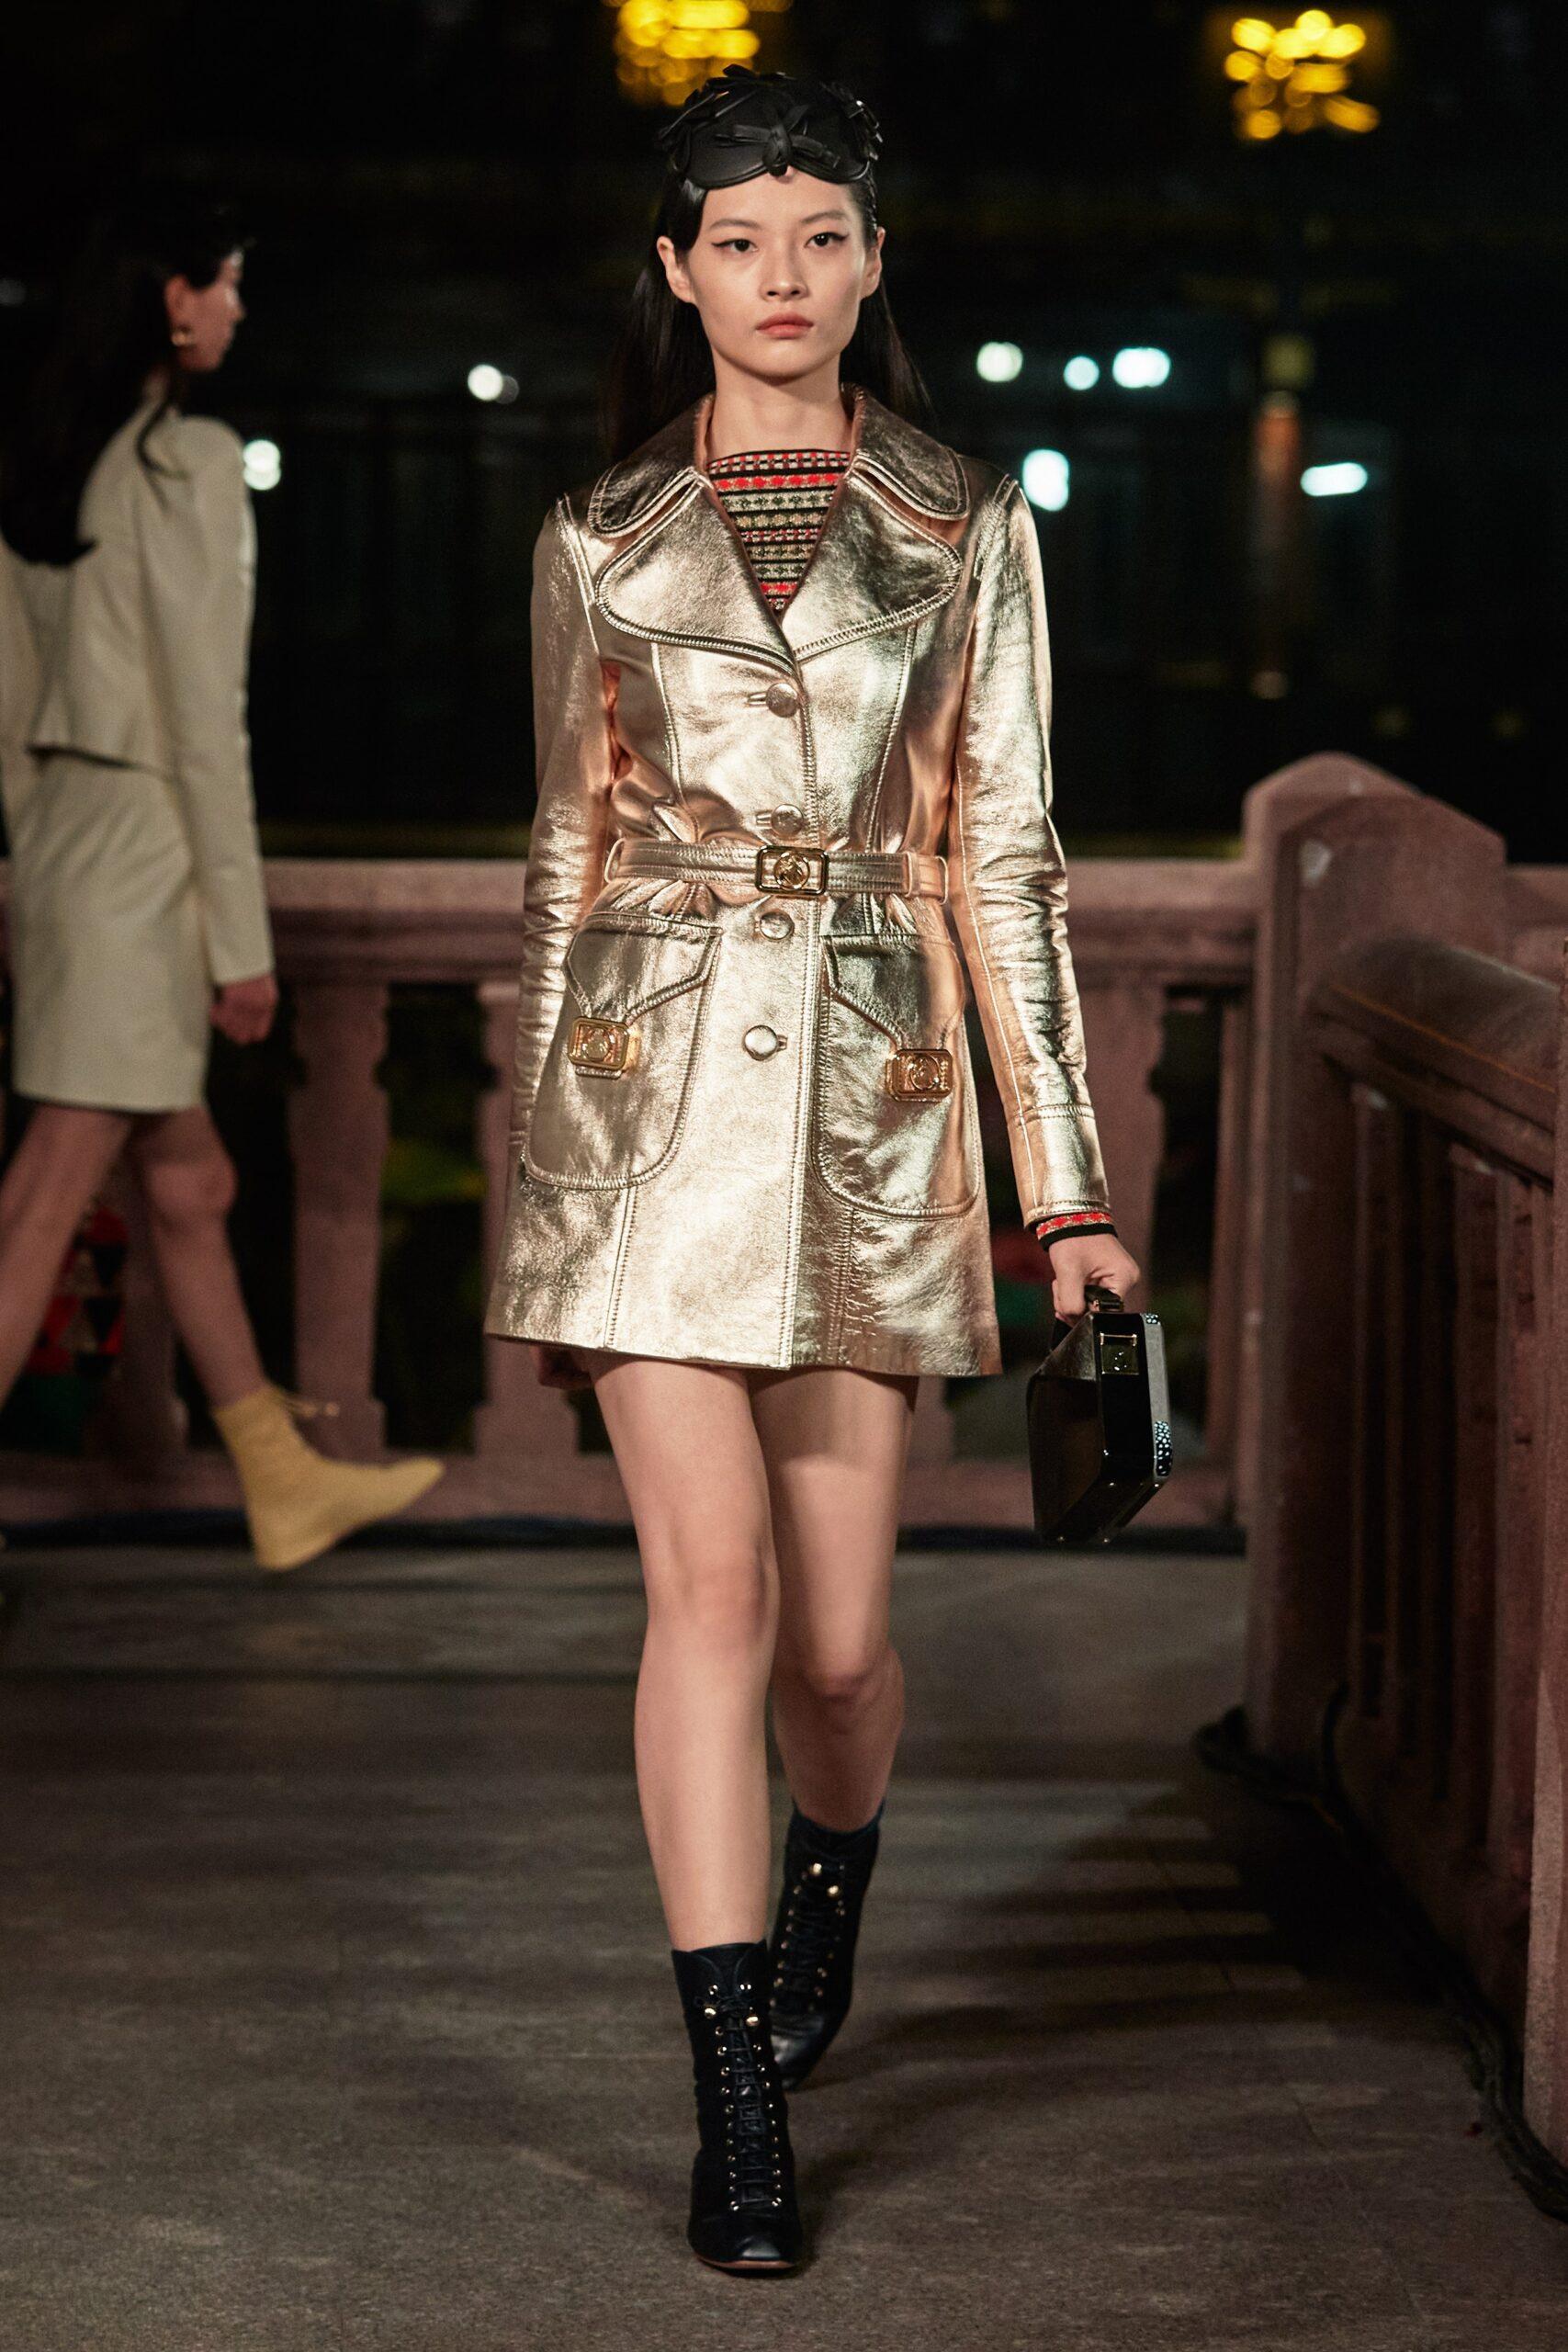 Oro e argento - Lanvin Ready-to-Wear Spring 2021